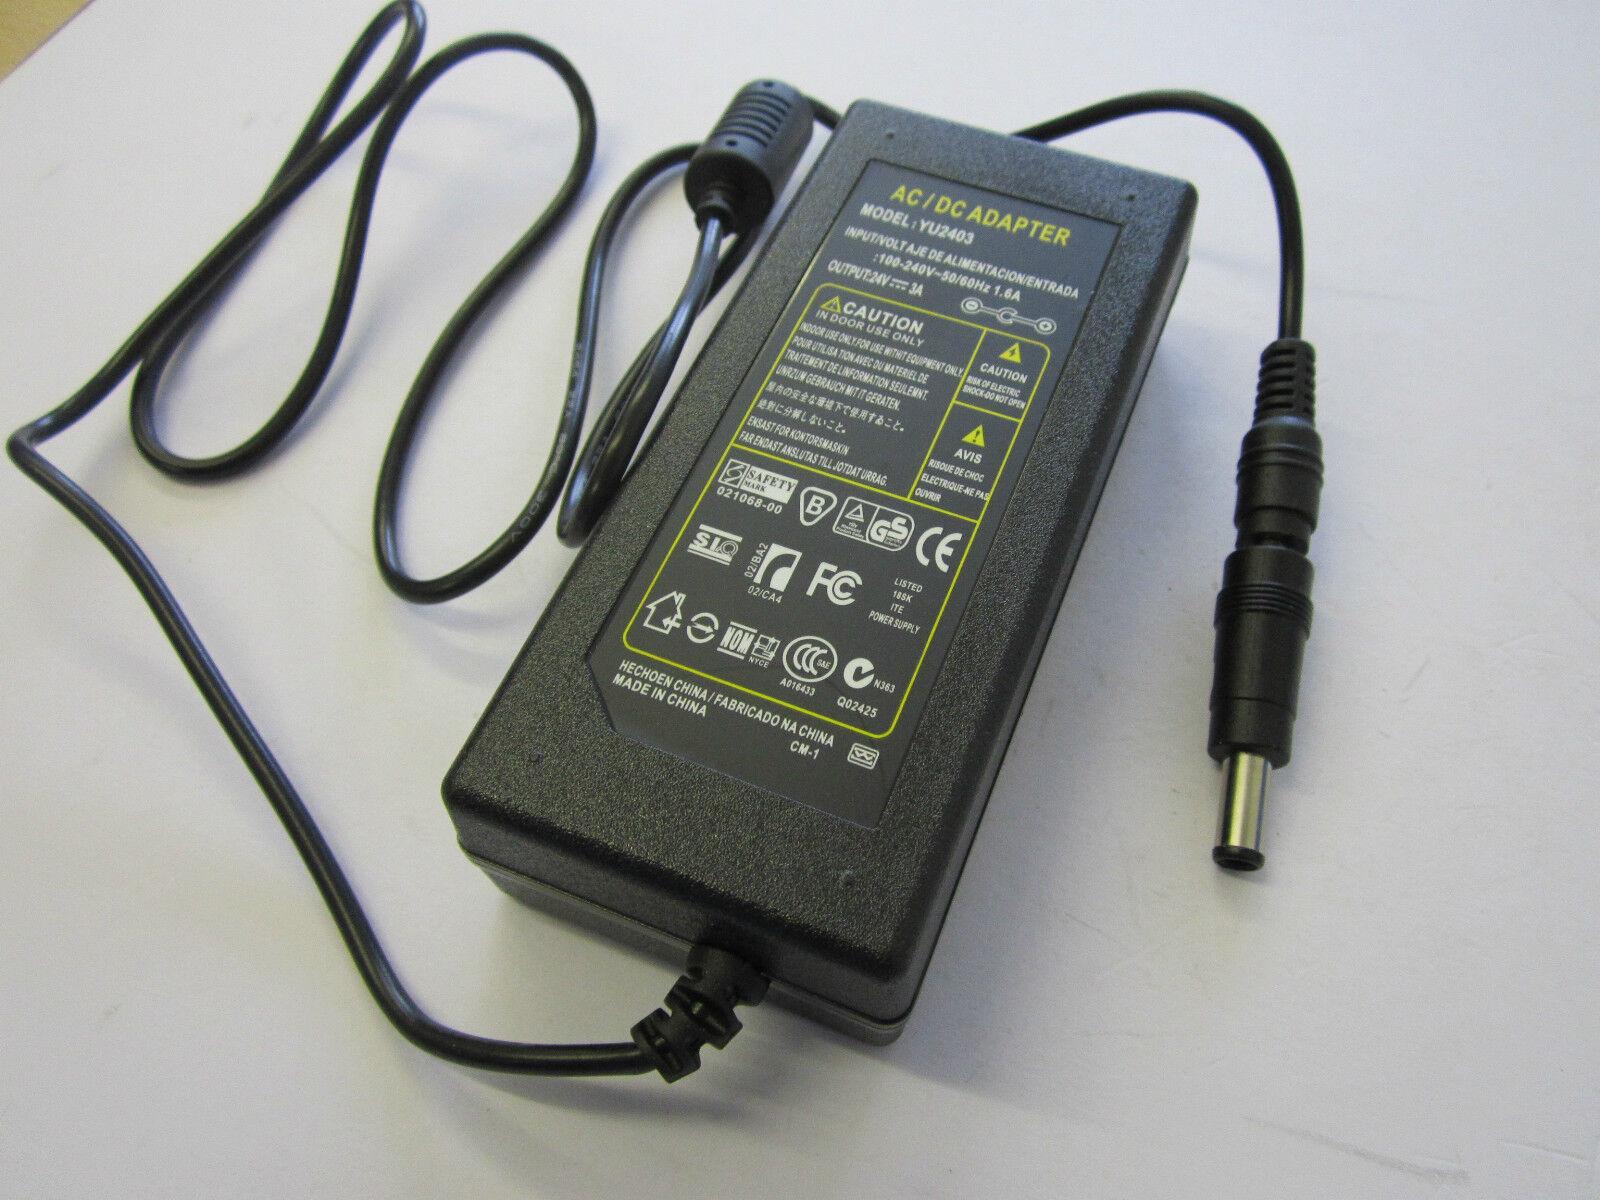 24V AC Adaptor Power Supply for Roland Desktop Vinyl Cutter | CAMM-1 Servo GS-24